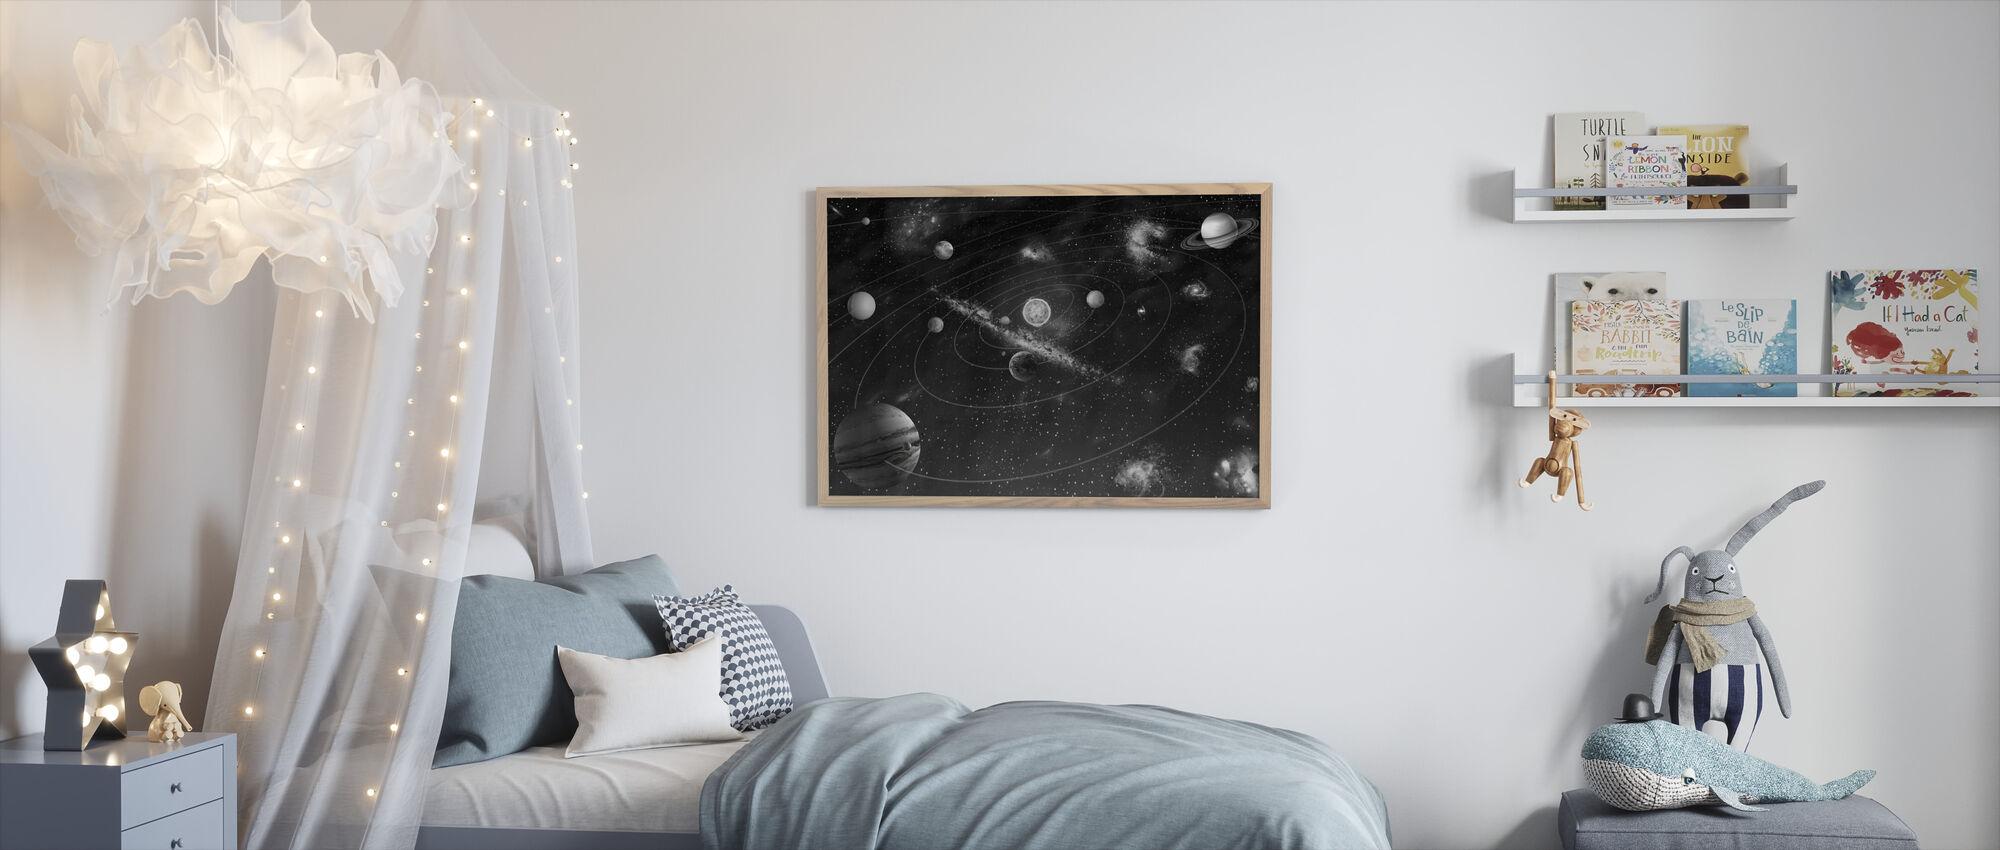 Zonnestelsel - z/w - Ingelijste print - Kinderkamer